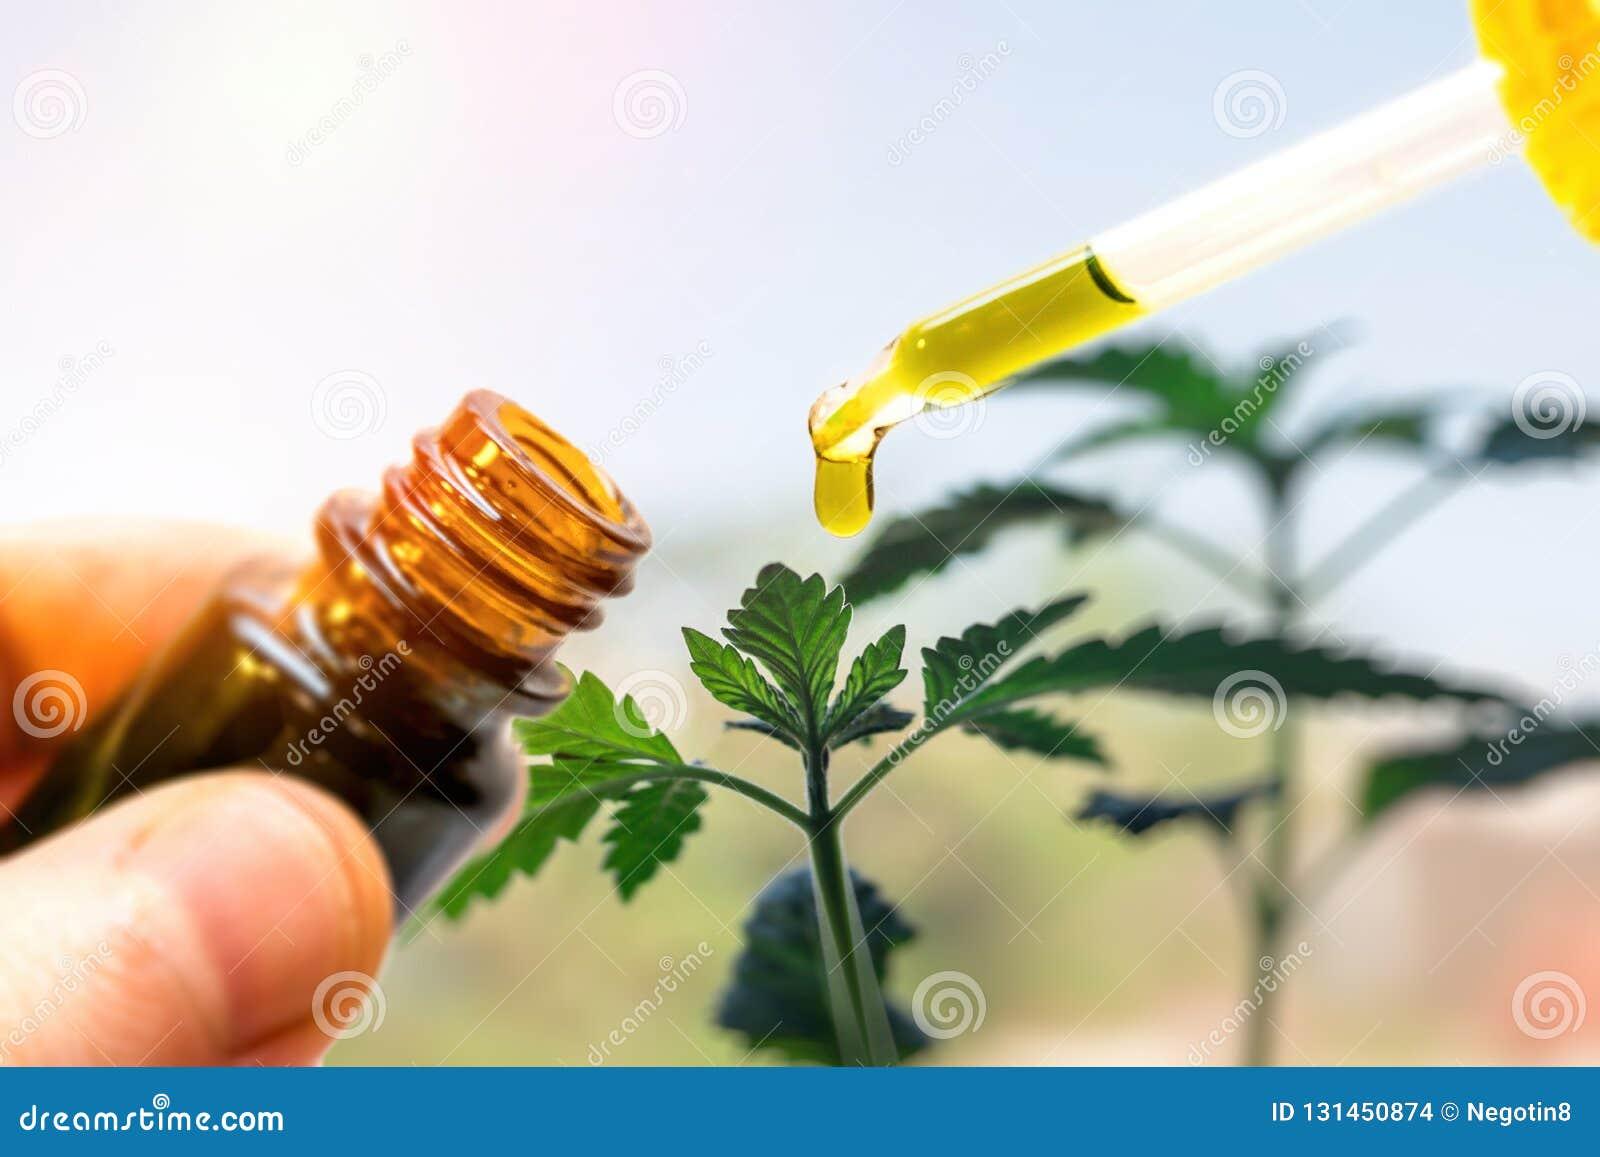 Hand holding bottle of Cannabis oil against Marijuana plant, CBD oil pipette